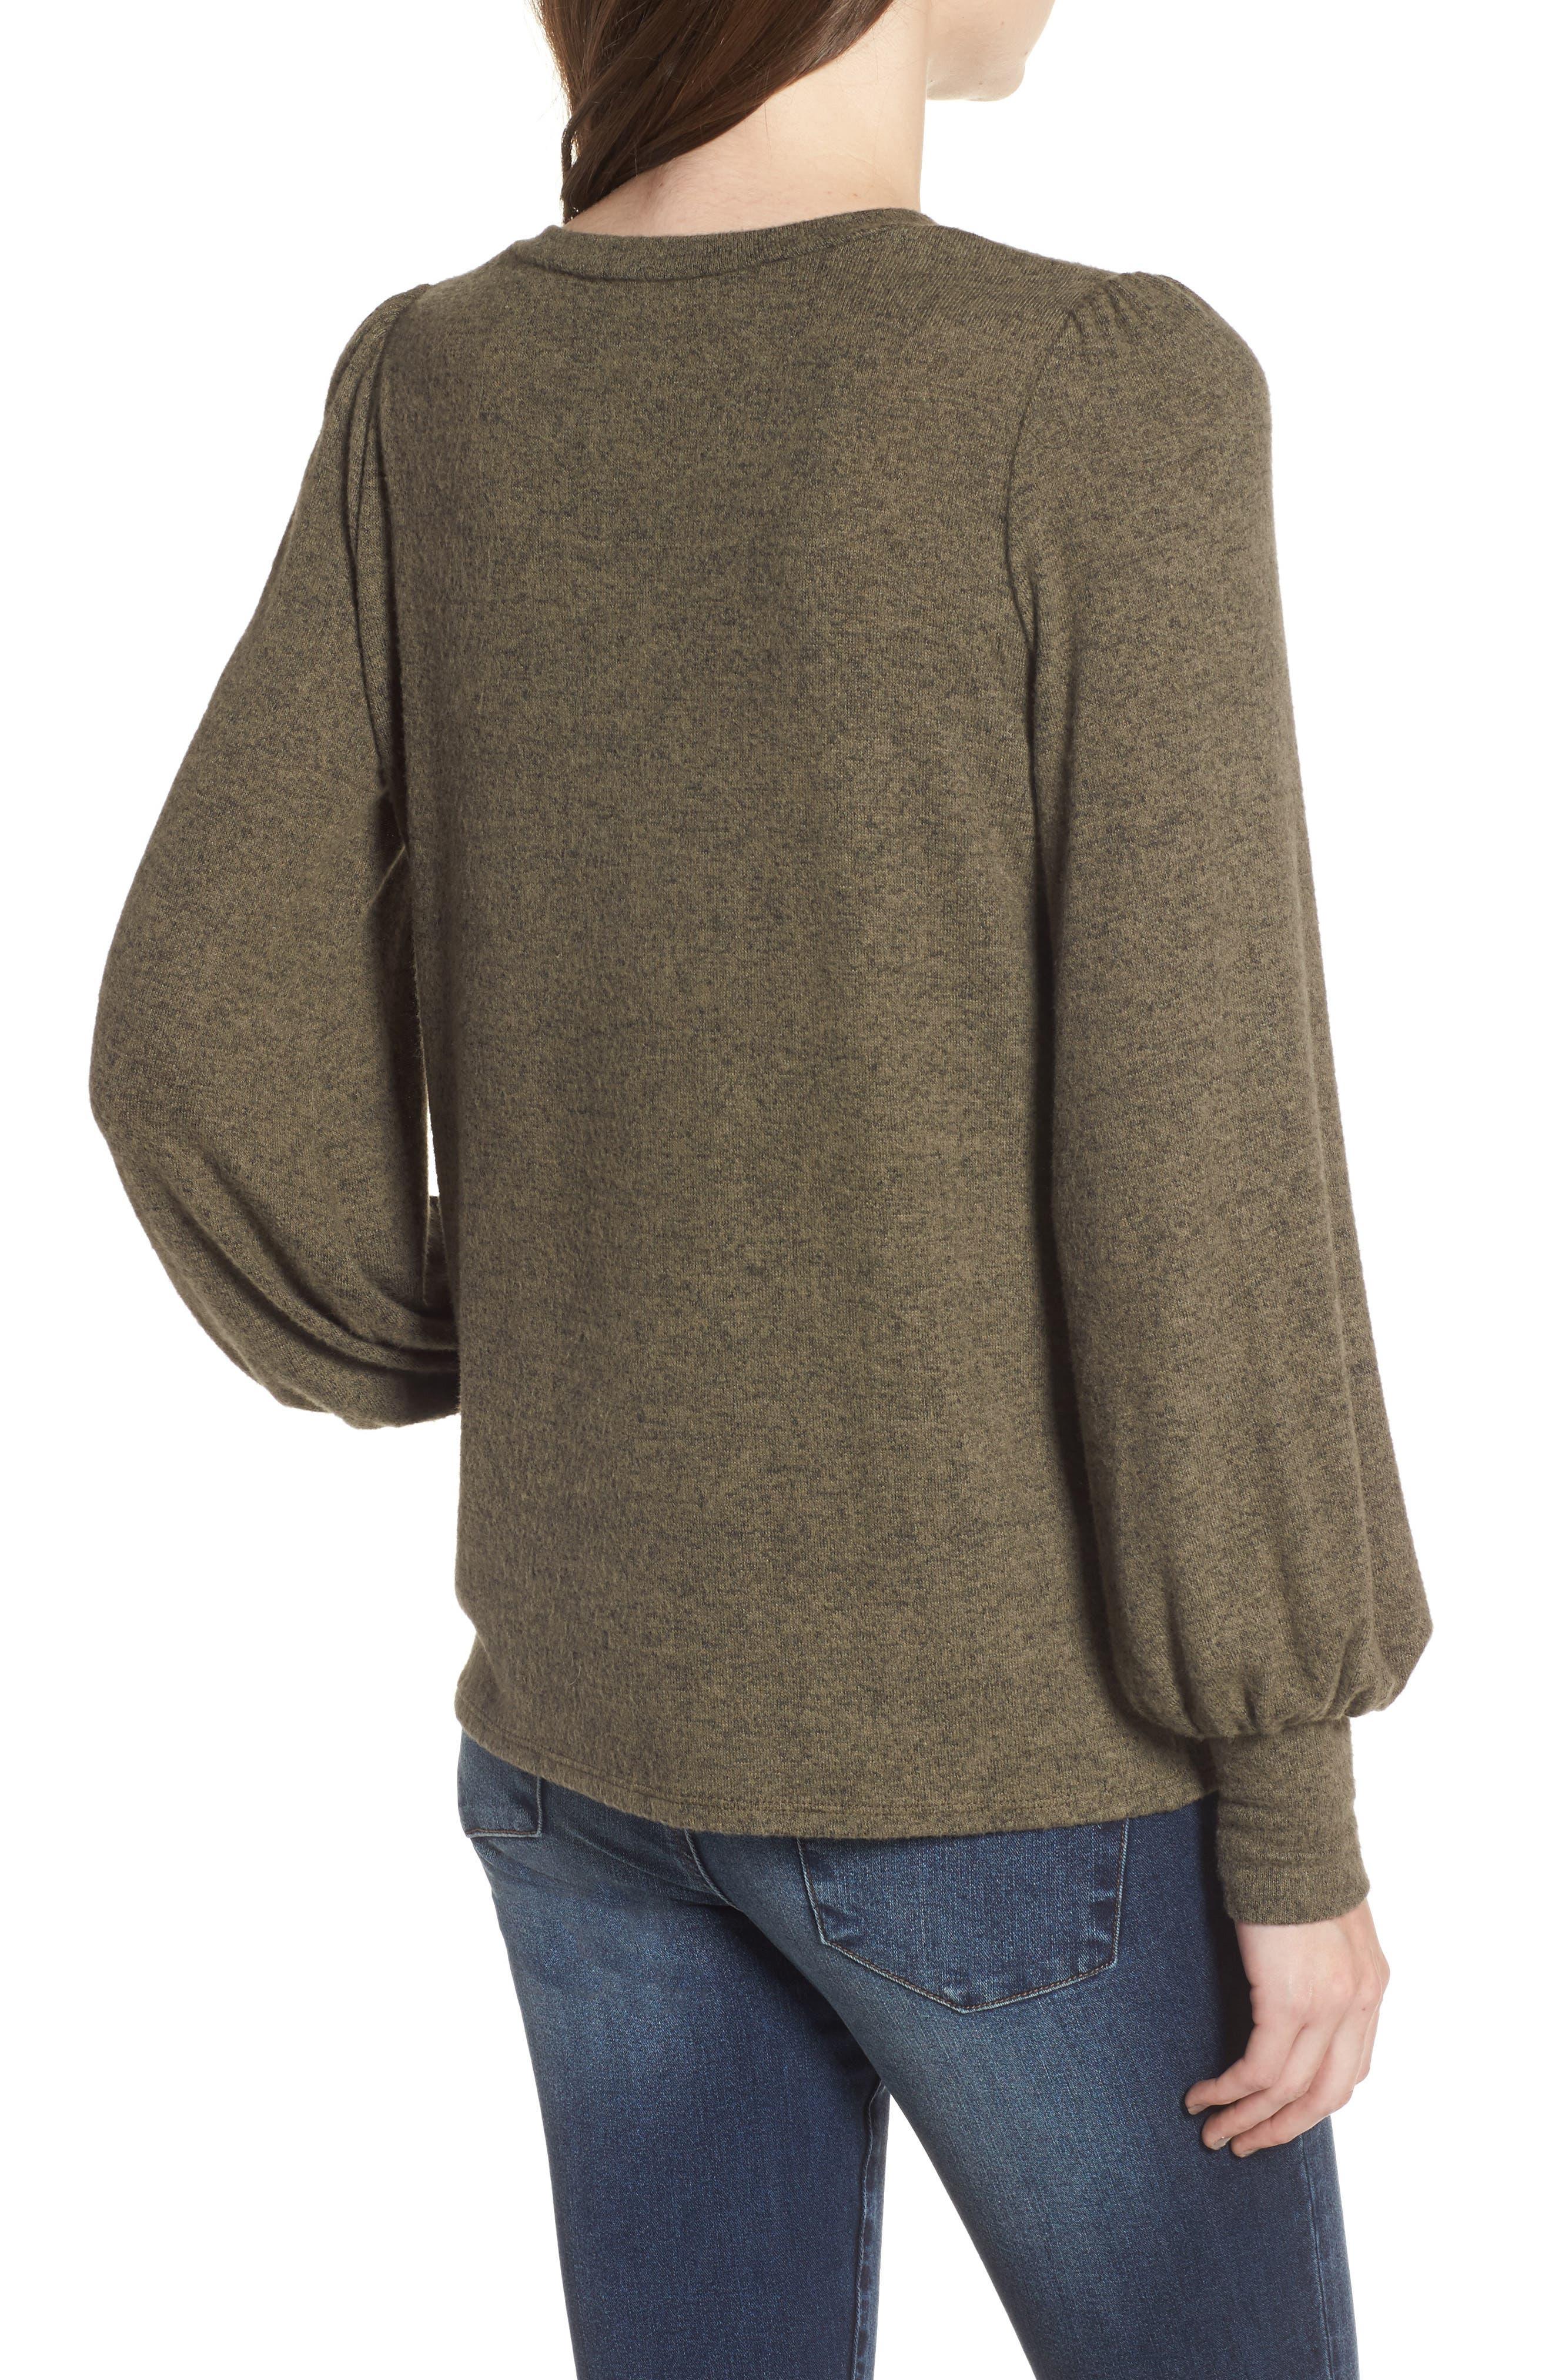 Bell Sleeve Pullover,                             Alternate thumbnail 2, color,                             Green